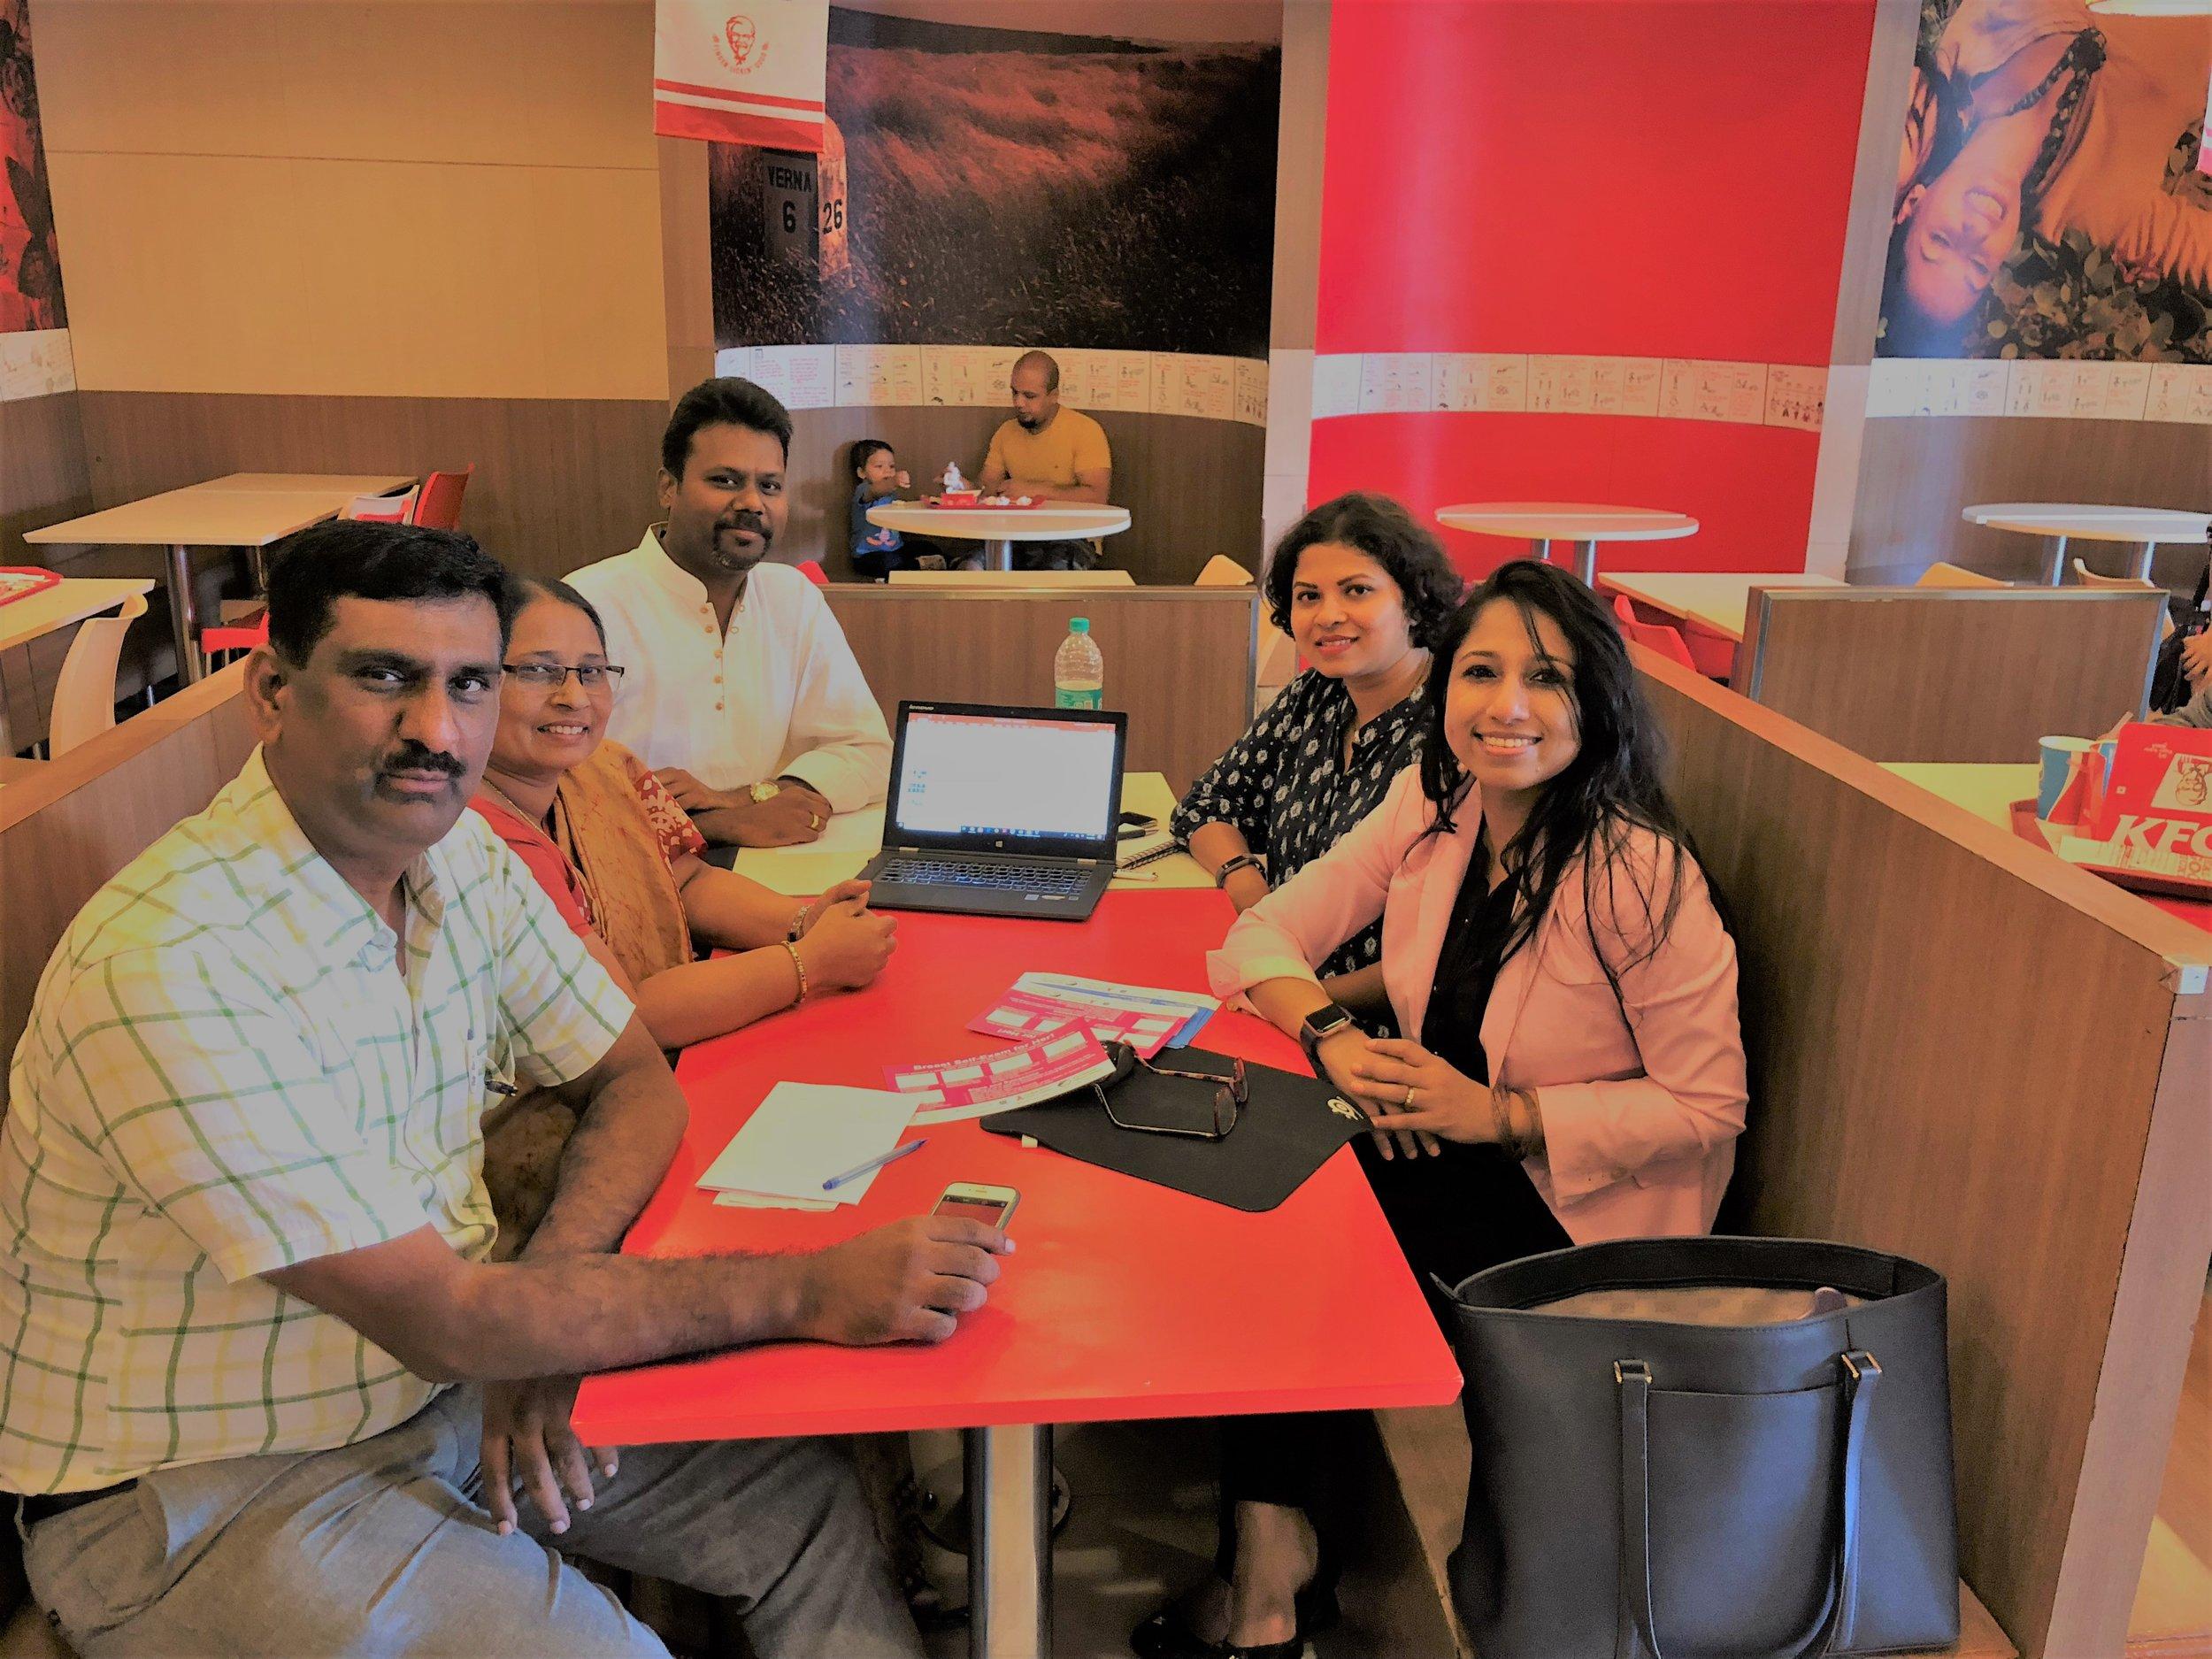 It was a privilege meeting Mr. KCN Reddy, Ms. Shobha Preetham Niranjan, Mr. Devarajan Kalladan  and Dr. Chethana Thirthahalli Collaborator: Mr. Devarajan Kalladan: Sincerely thankful to Arun Arunachalam from Northwesten Kellogg School of Management for getting me in touch with Devarajan, Director, Rotary Club of Bangalore, Koramangala. I am thankful to Mr. Devarajan for introducing me to KCN Reddy, Shobha Preetham and Dr. Chethana Thirthahalli